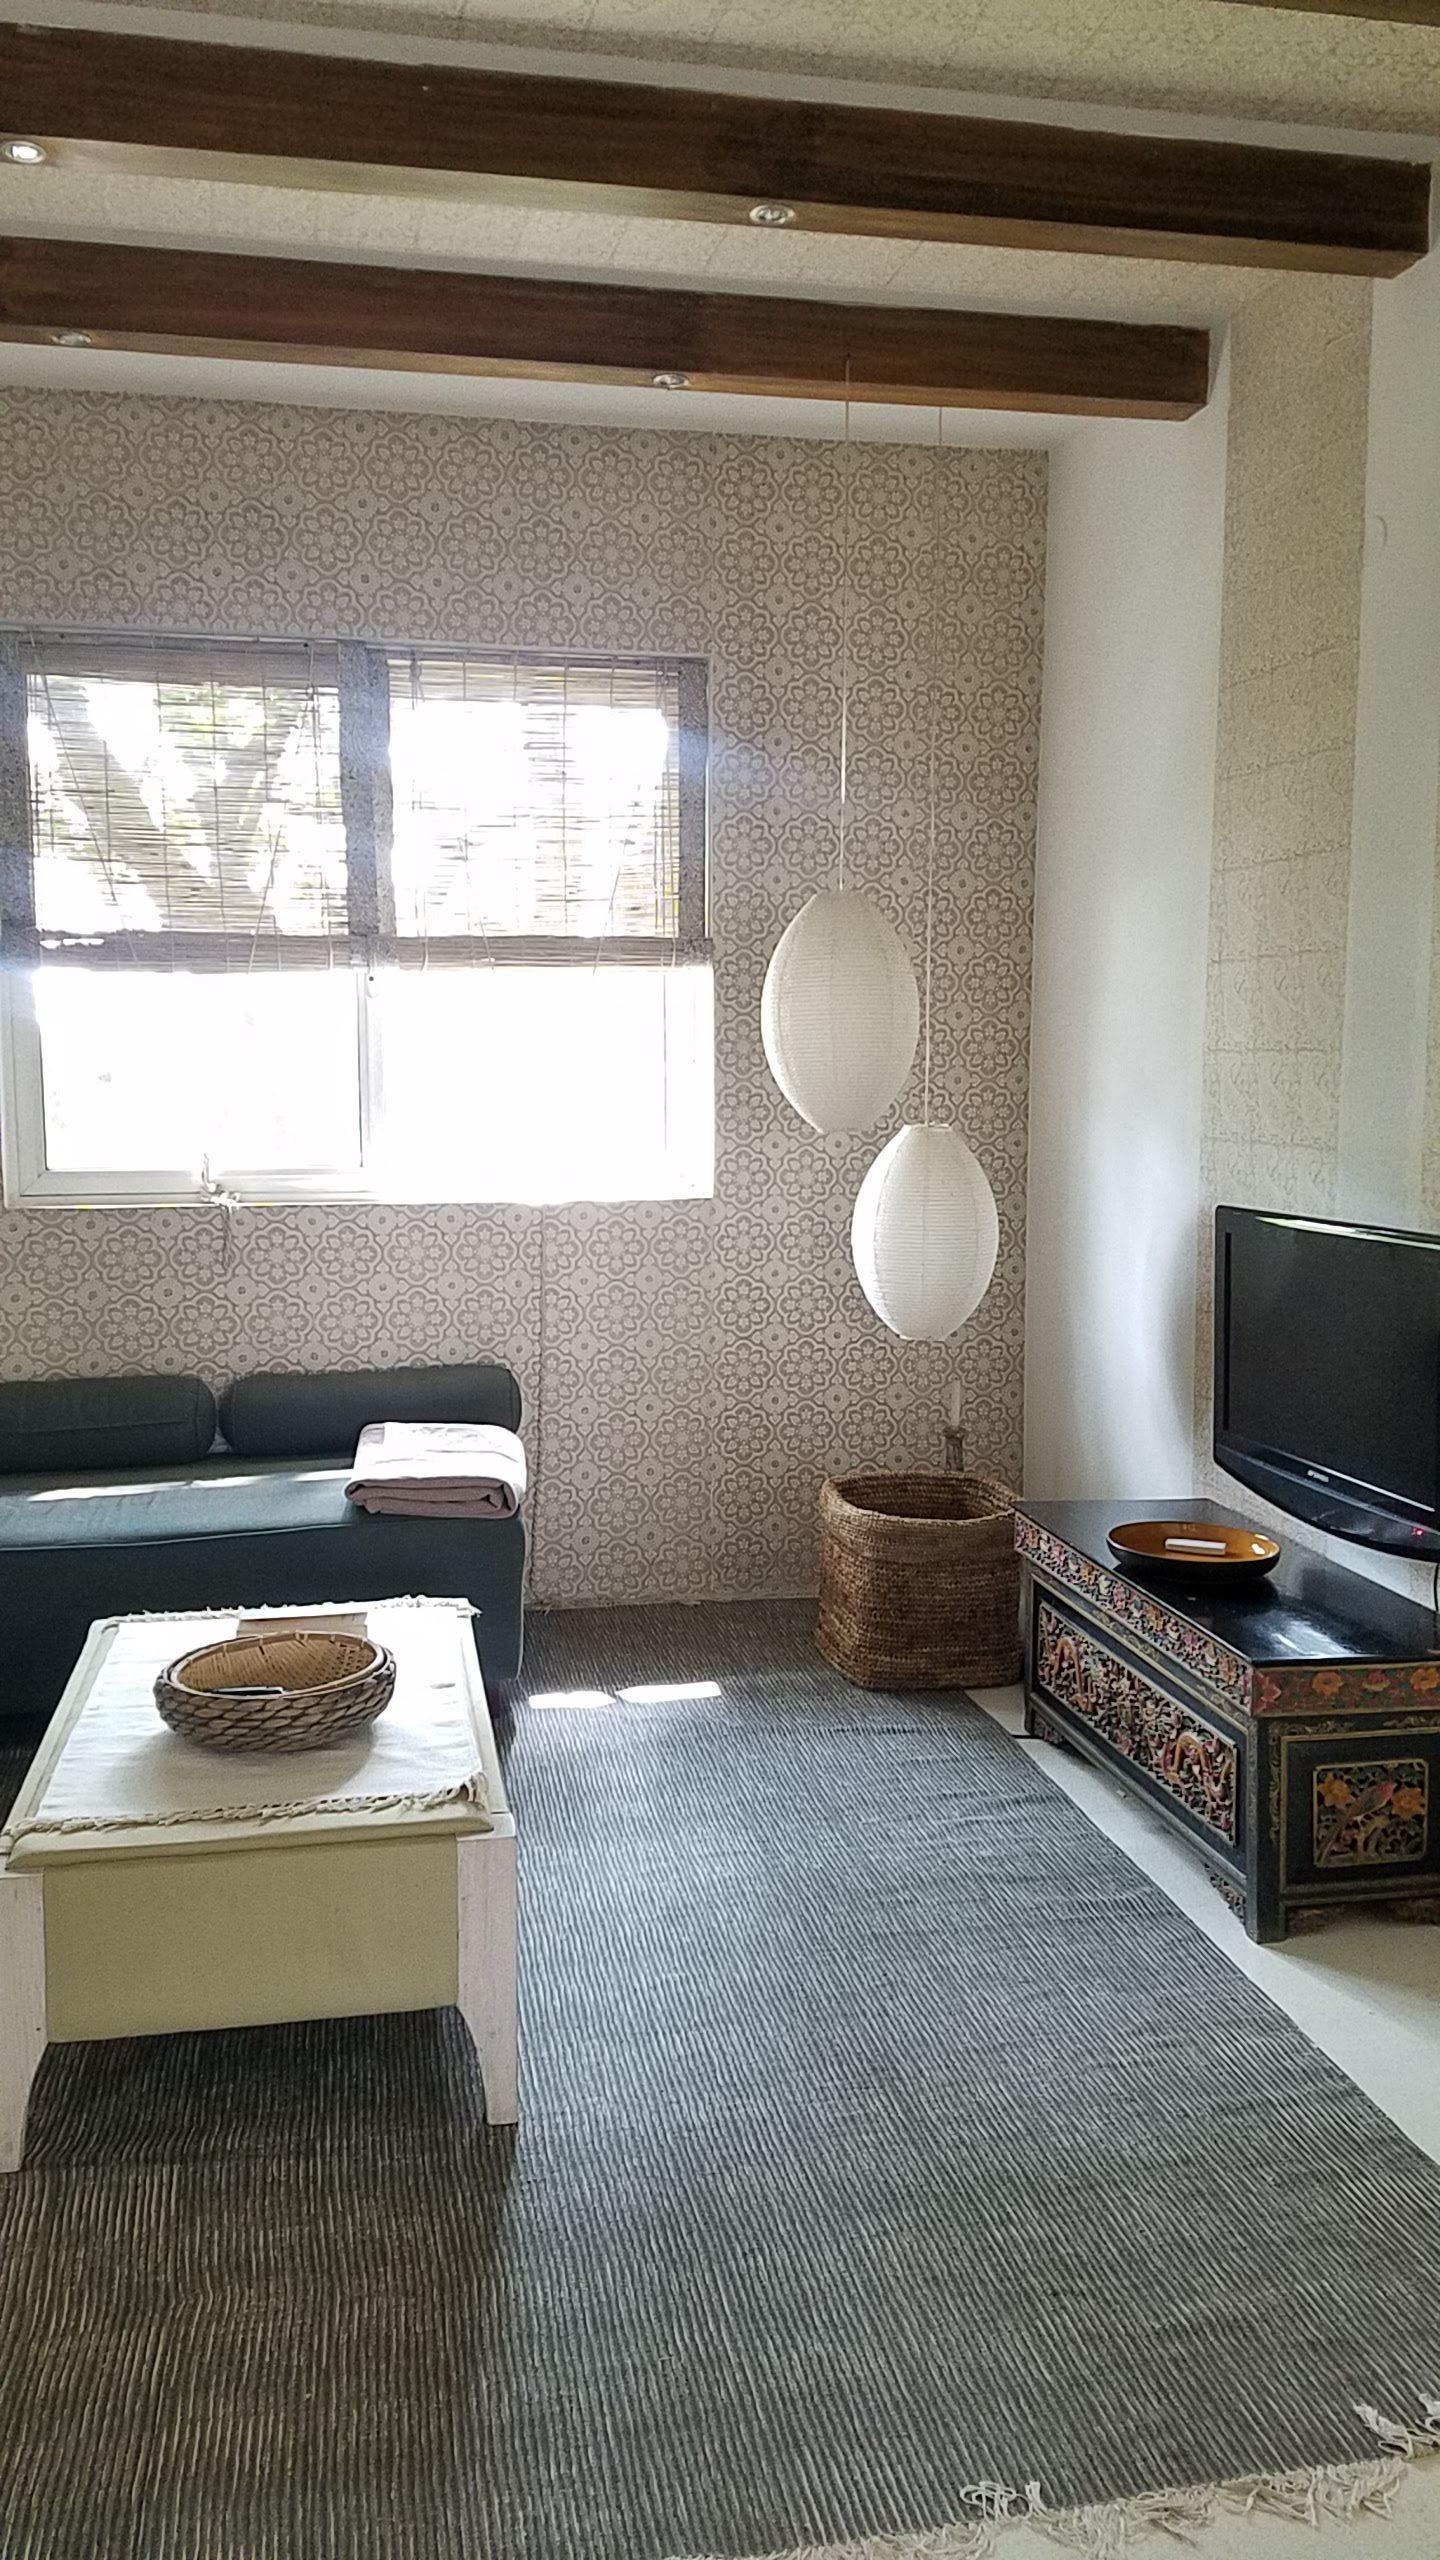 Sonali's sitting room